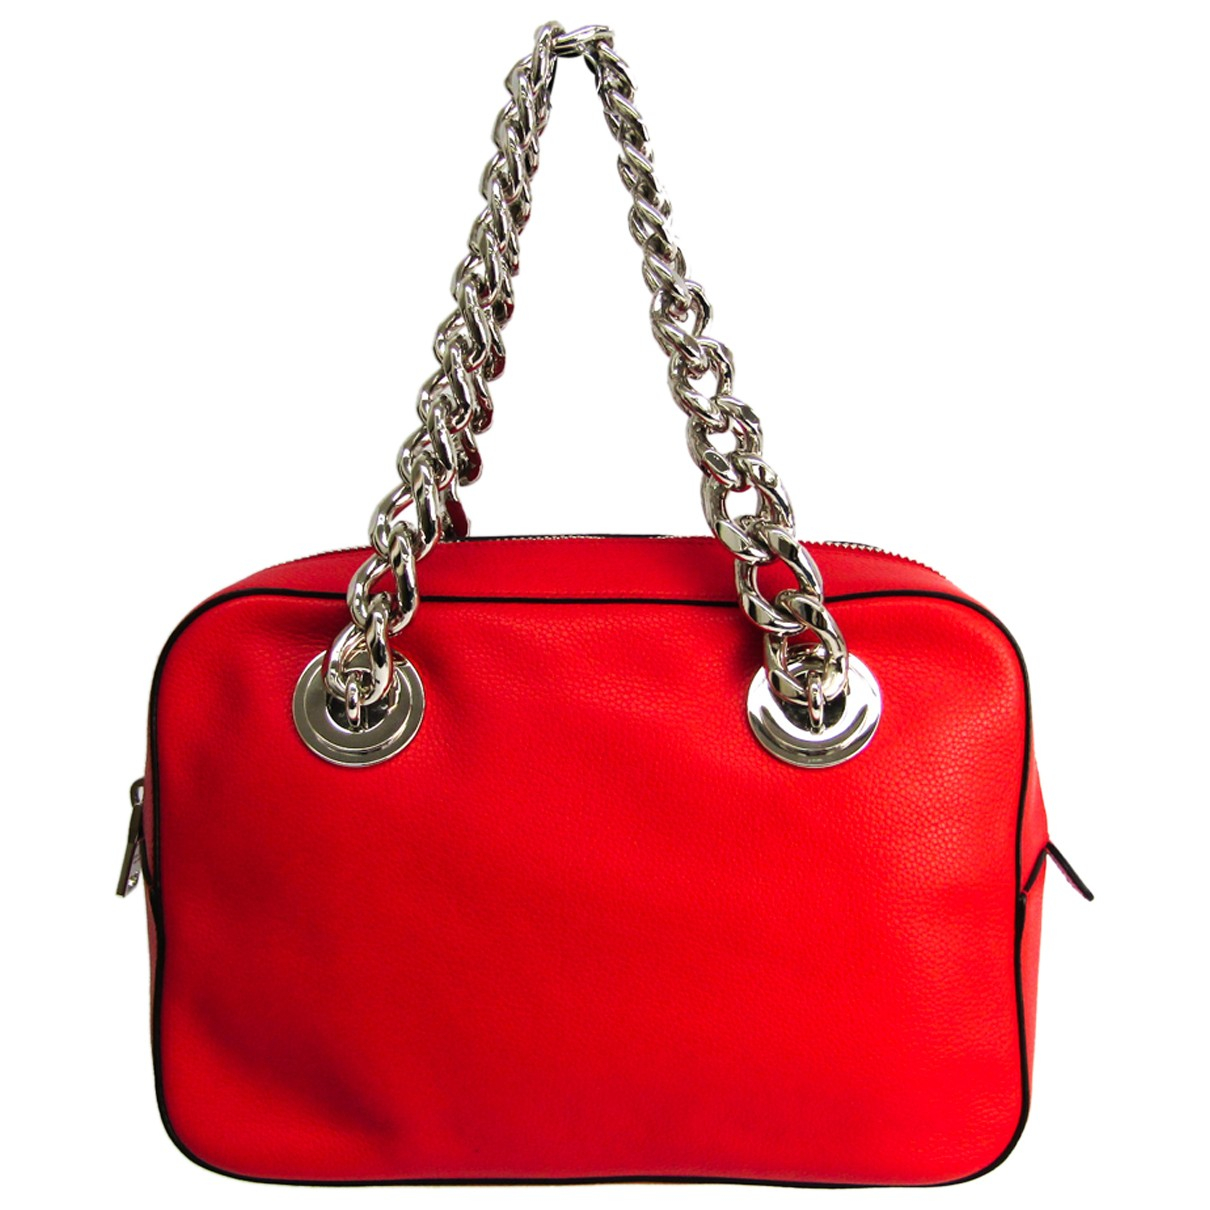 Prada N Red Leather handbag for Women N